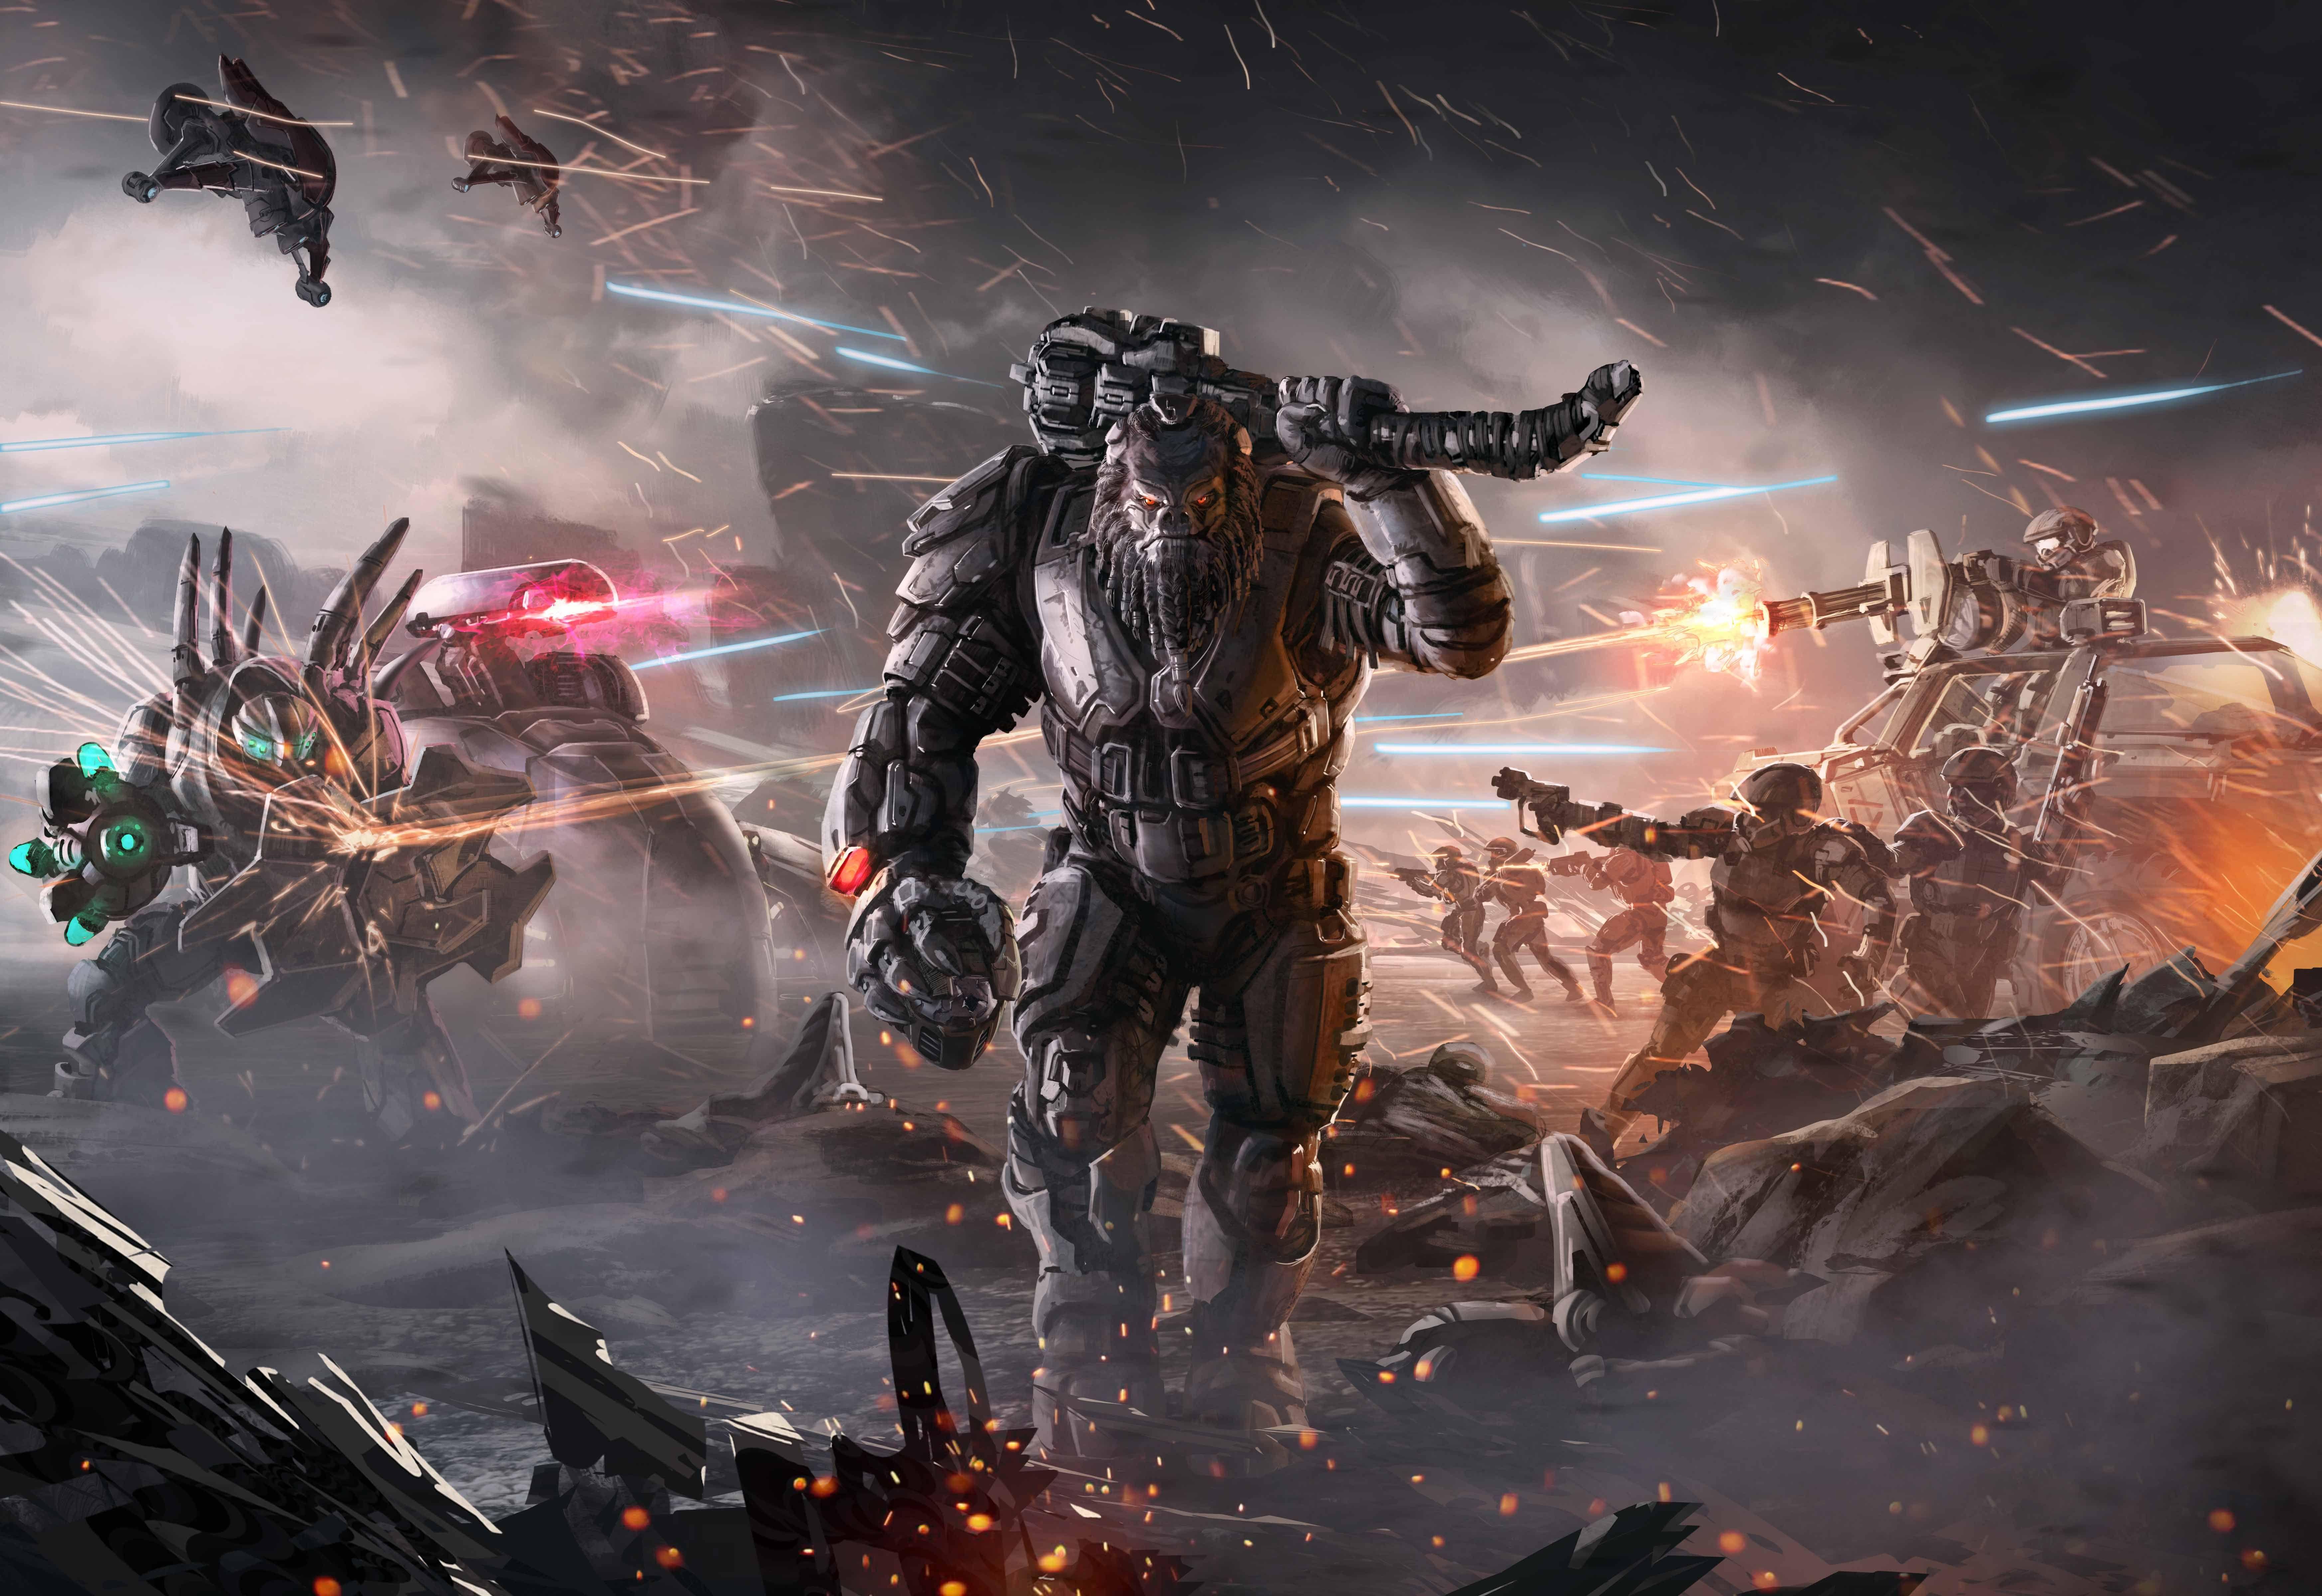 Halo Wars Wallpaper Game Wallpapers